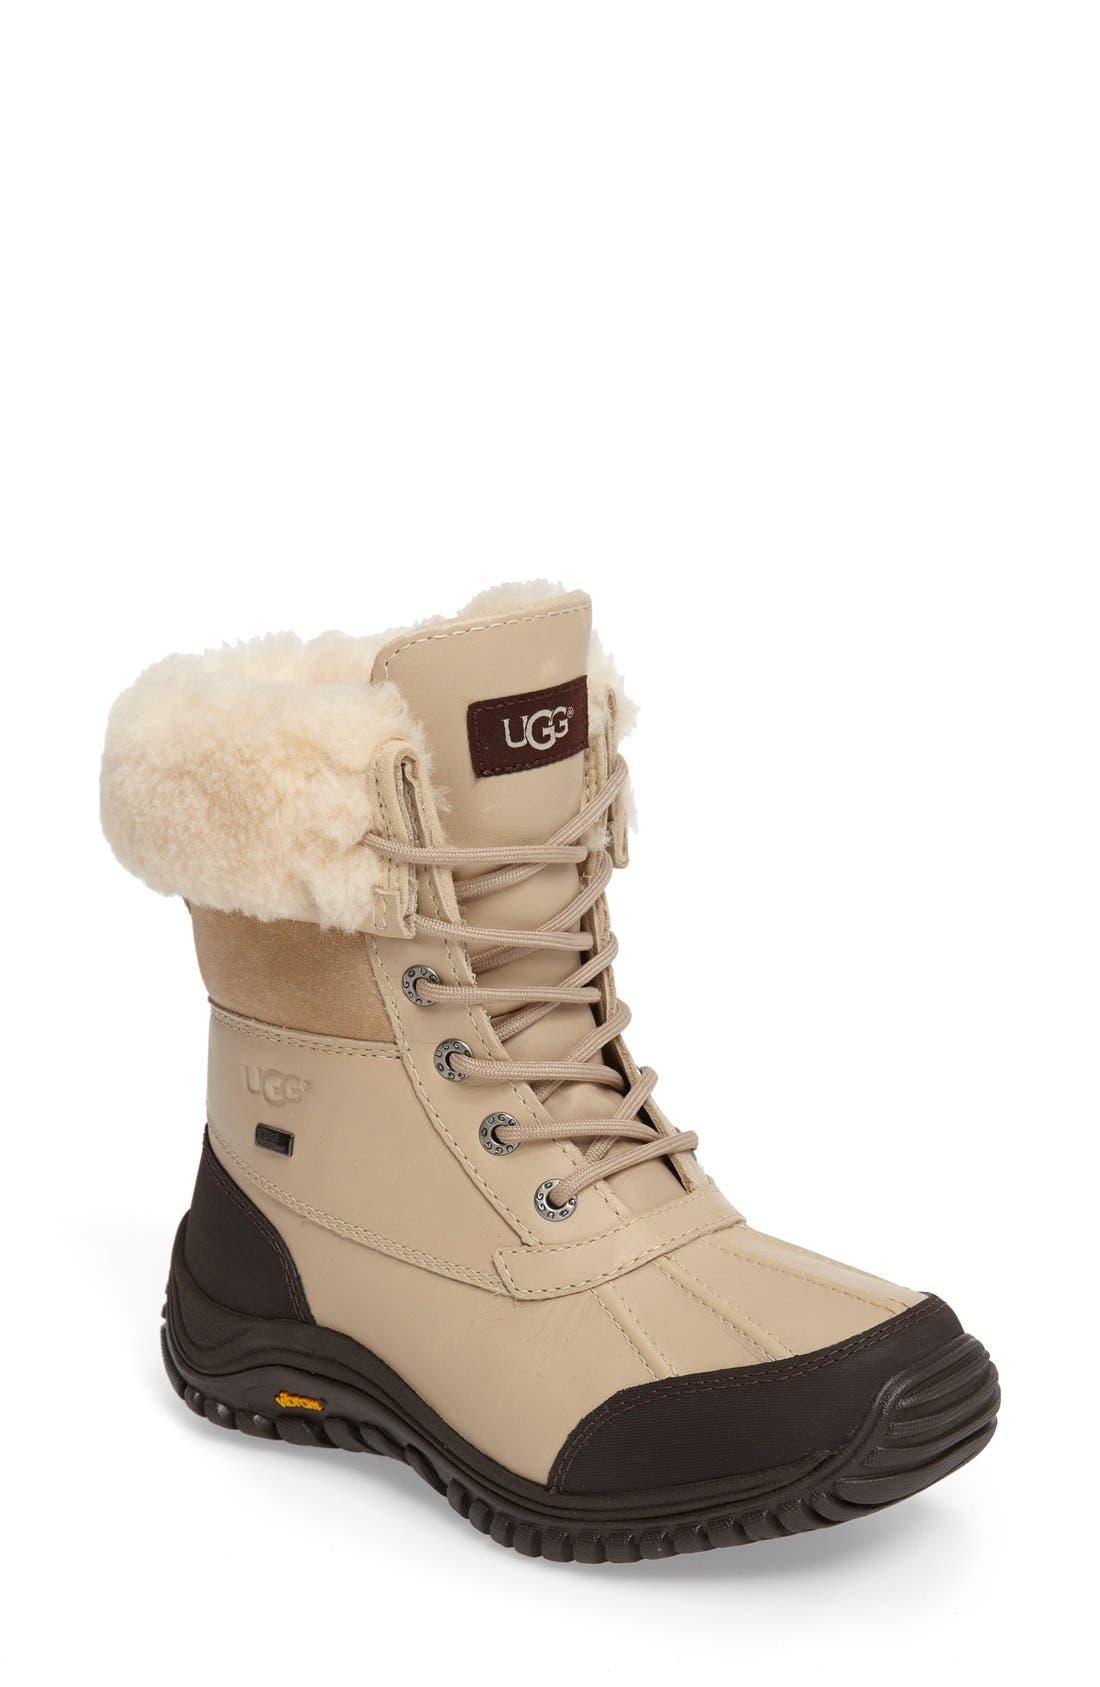 Main Image - UGG® Adirondack II Waterproof Boot (Women)